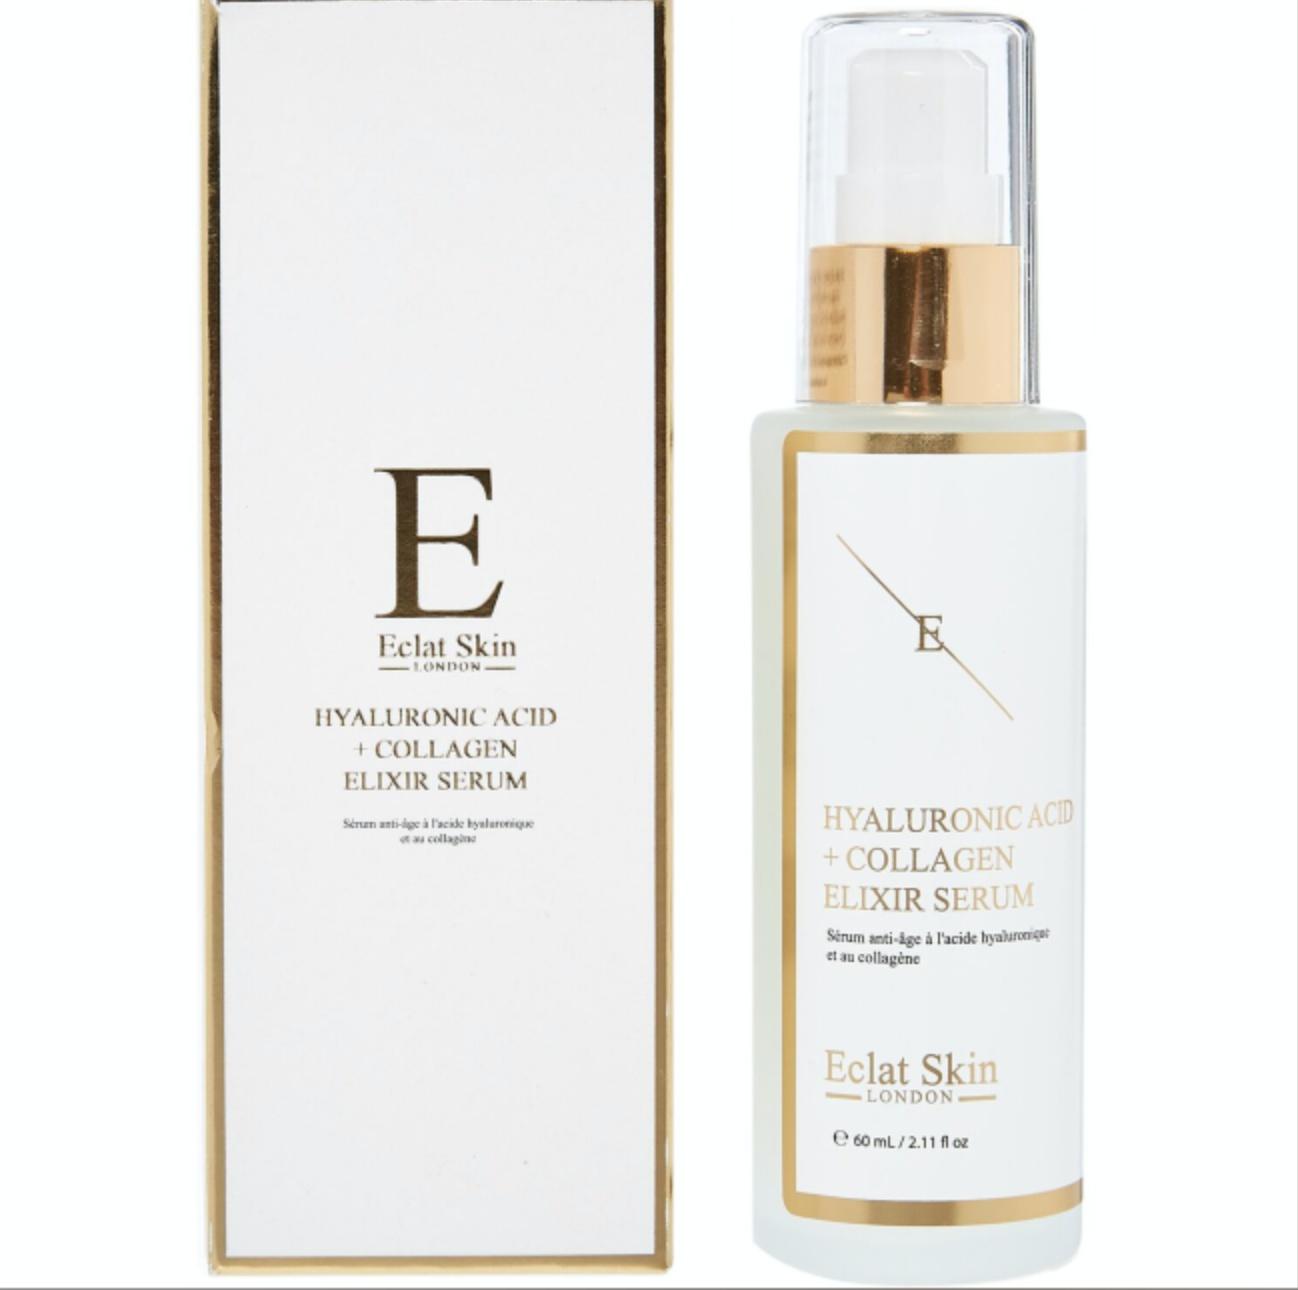 Eclat skin Hyaluronic Acid & Collagen Serum